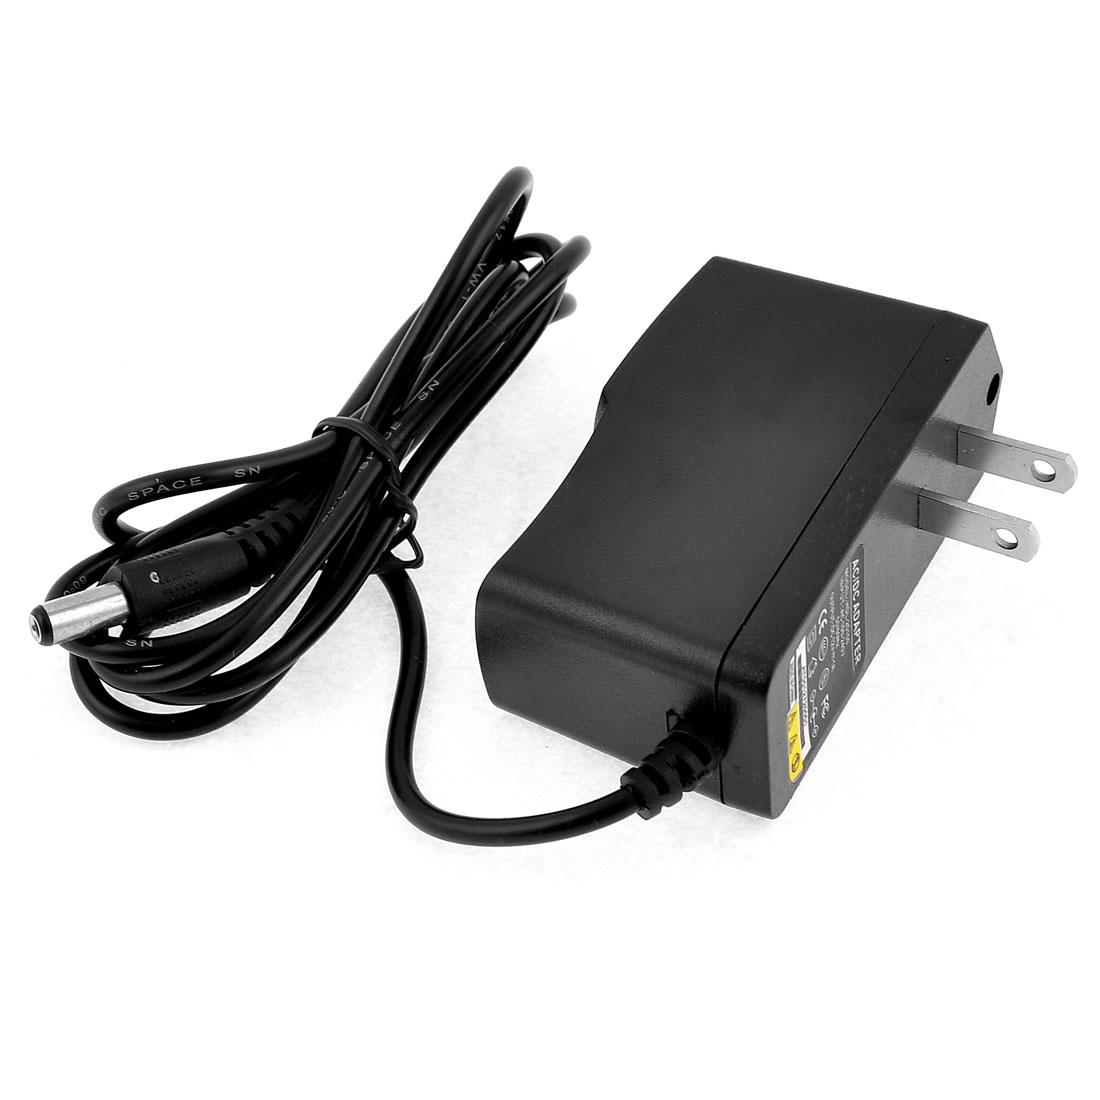 US Plug AC 100/240V 50-60Hz to DC 12V Black Wall Power Adapter